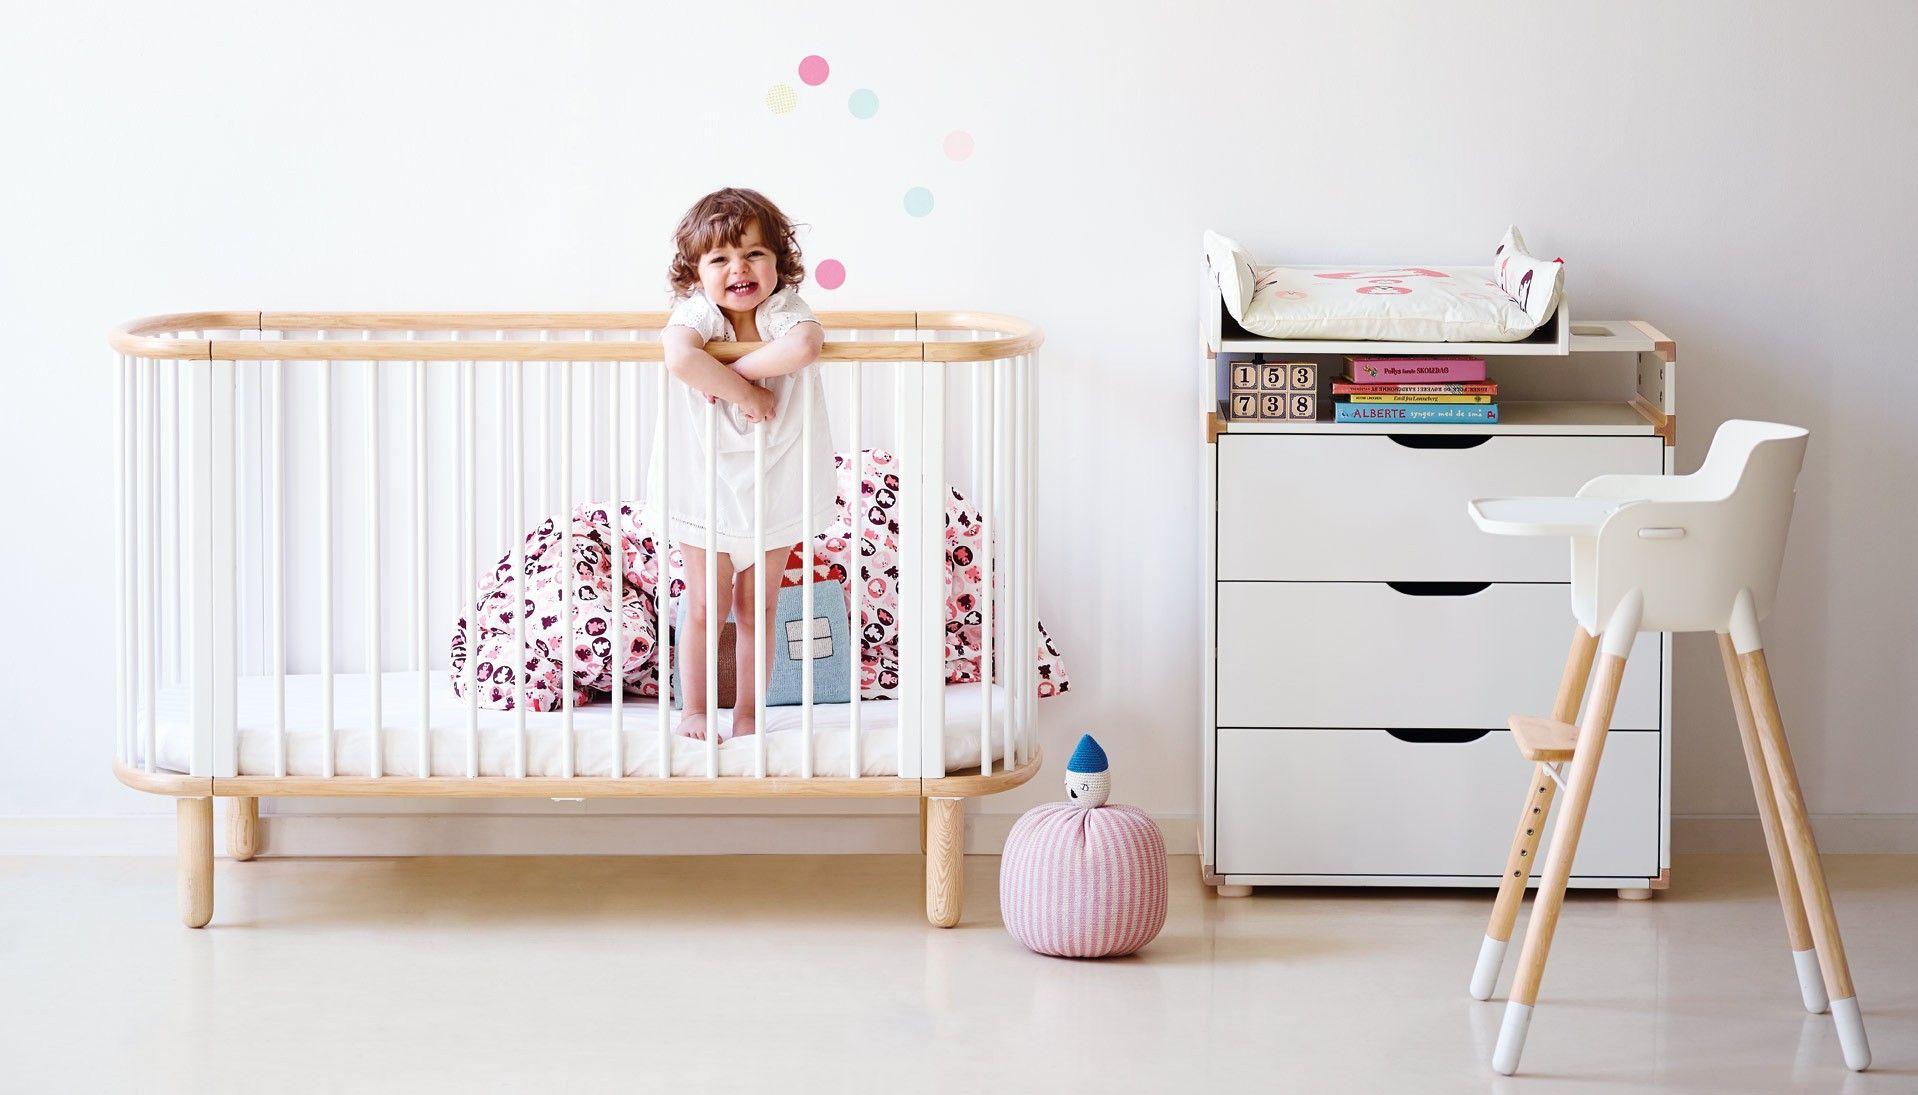 Flexa Cots, Bunks And Childrens Furniture Simple, Stylish, Scandinavian